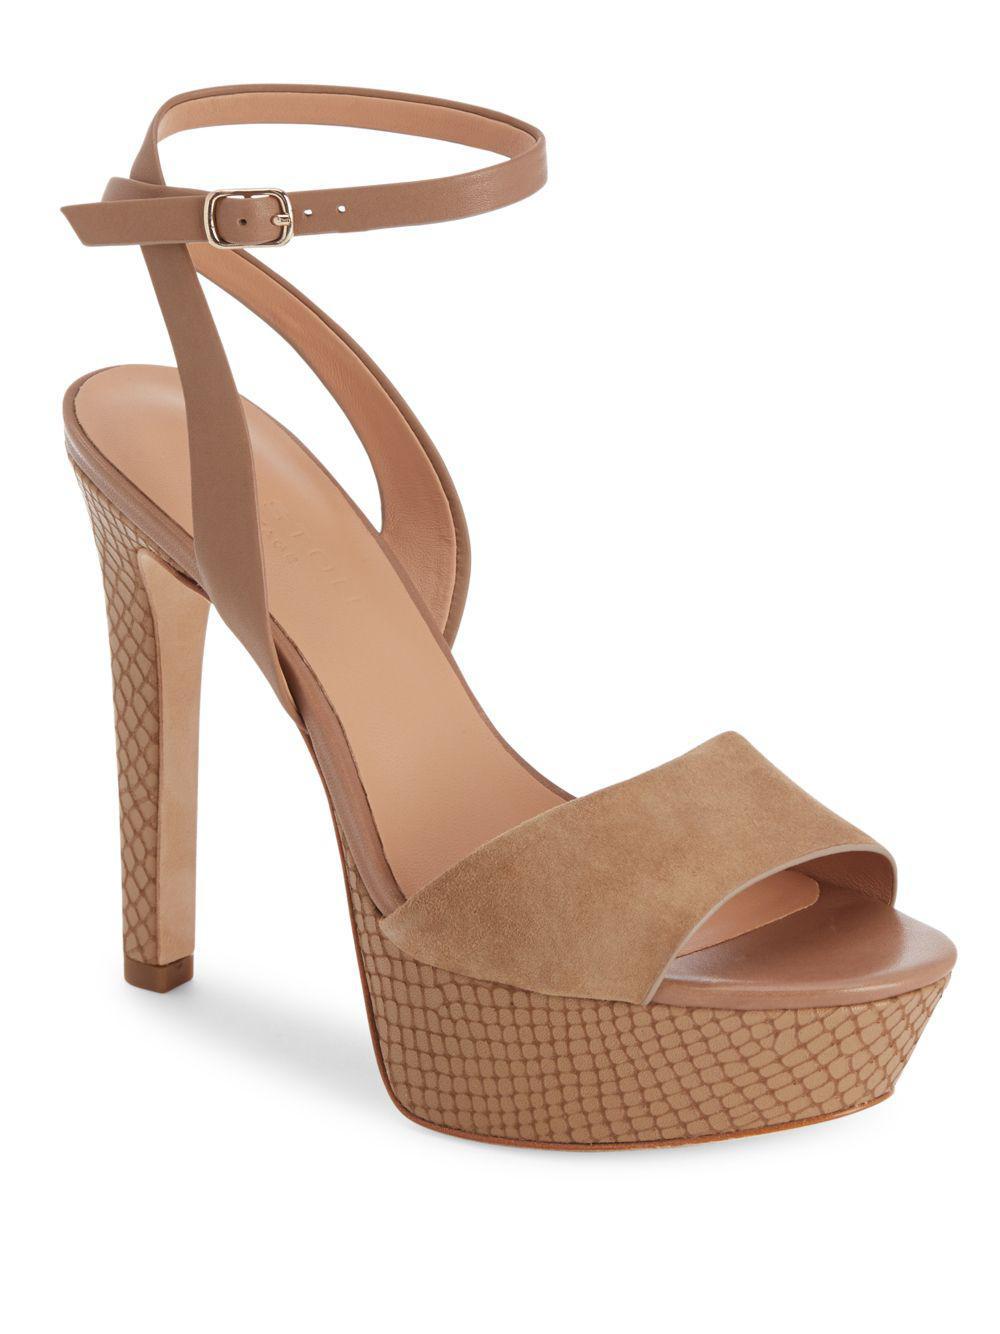 3ccdfbb4b289 Lyst - Halston Heritage Leather Open-toe Platform Sandals